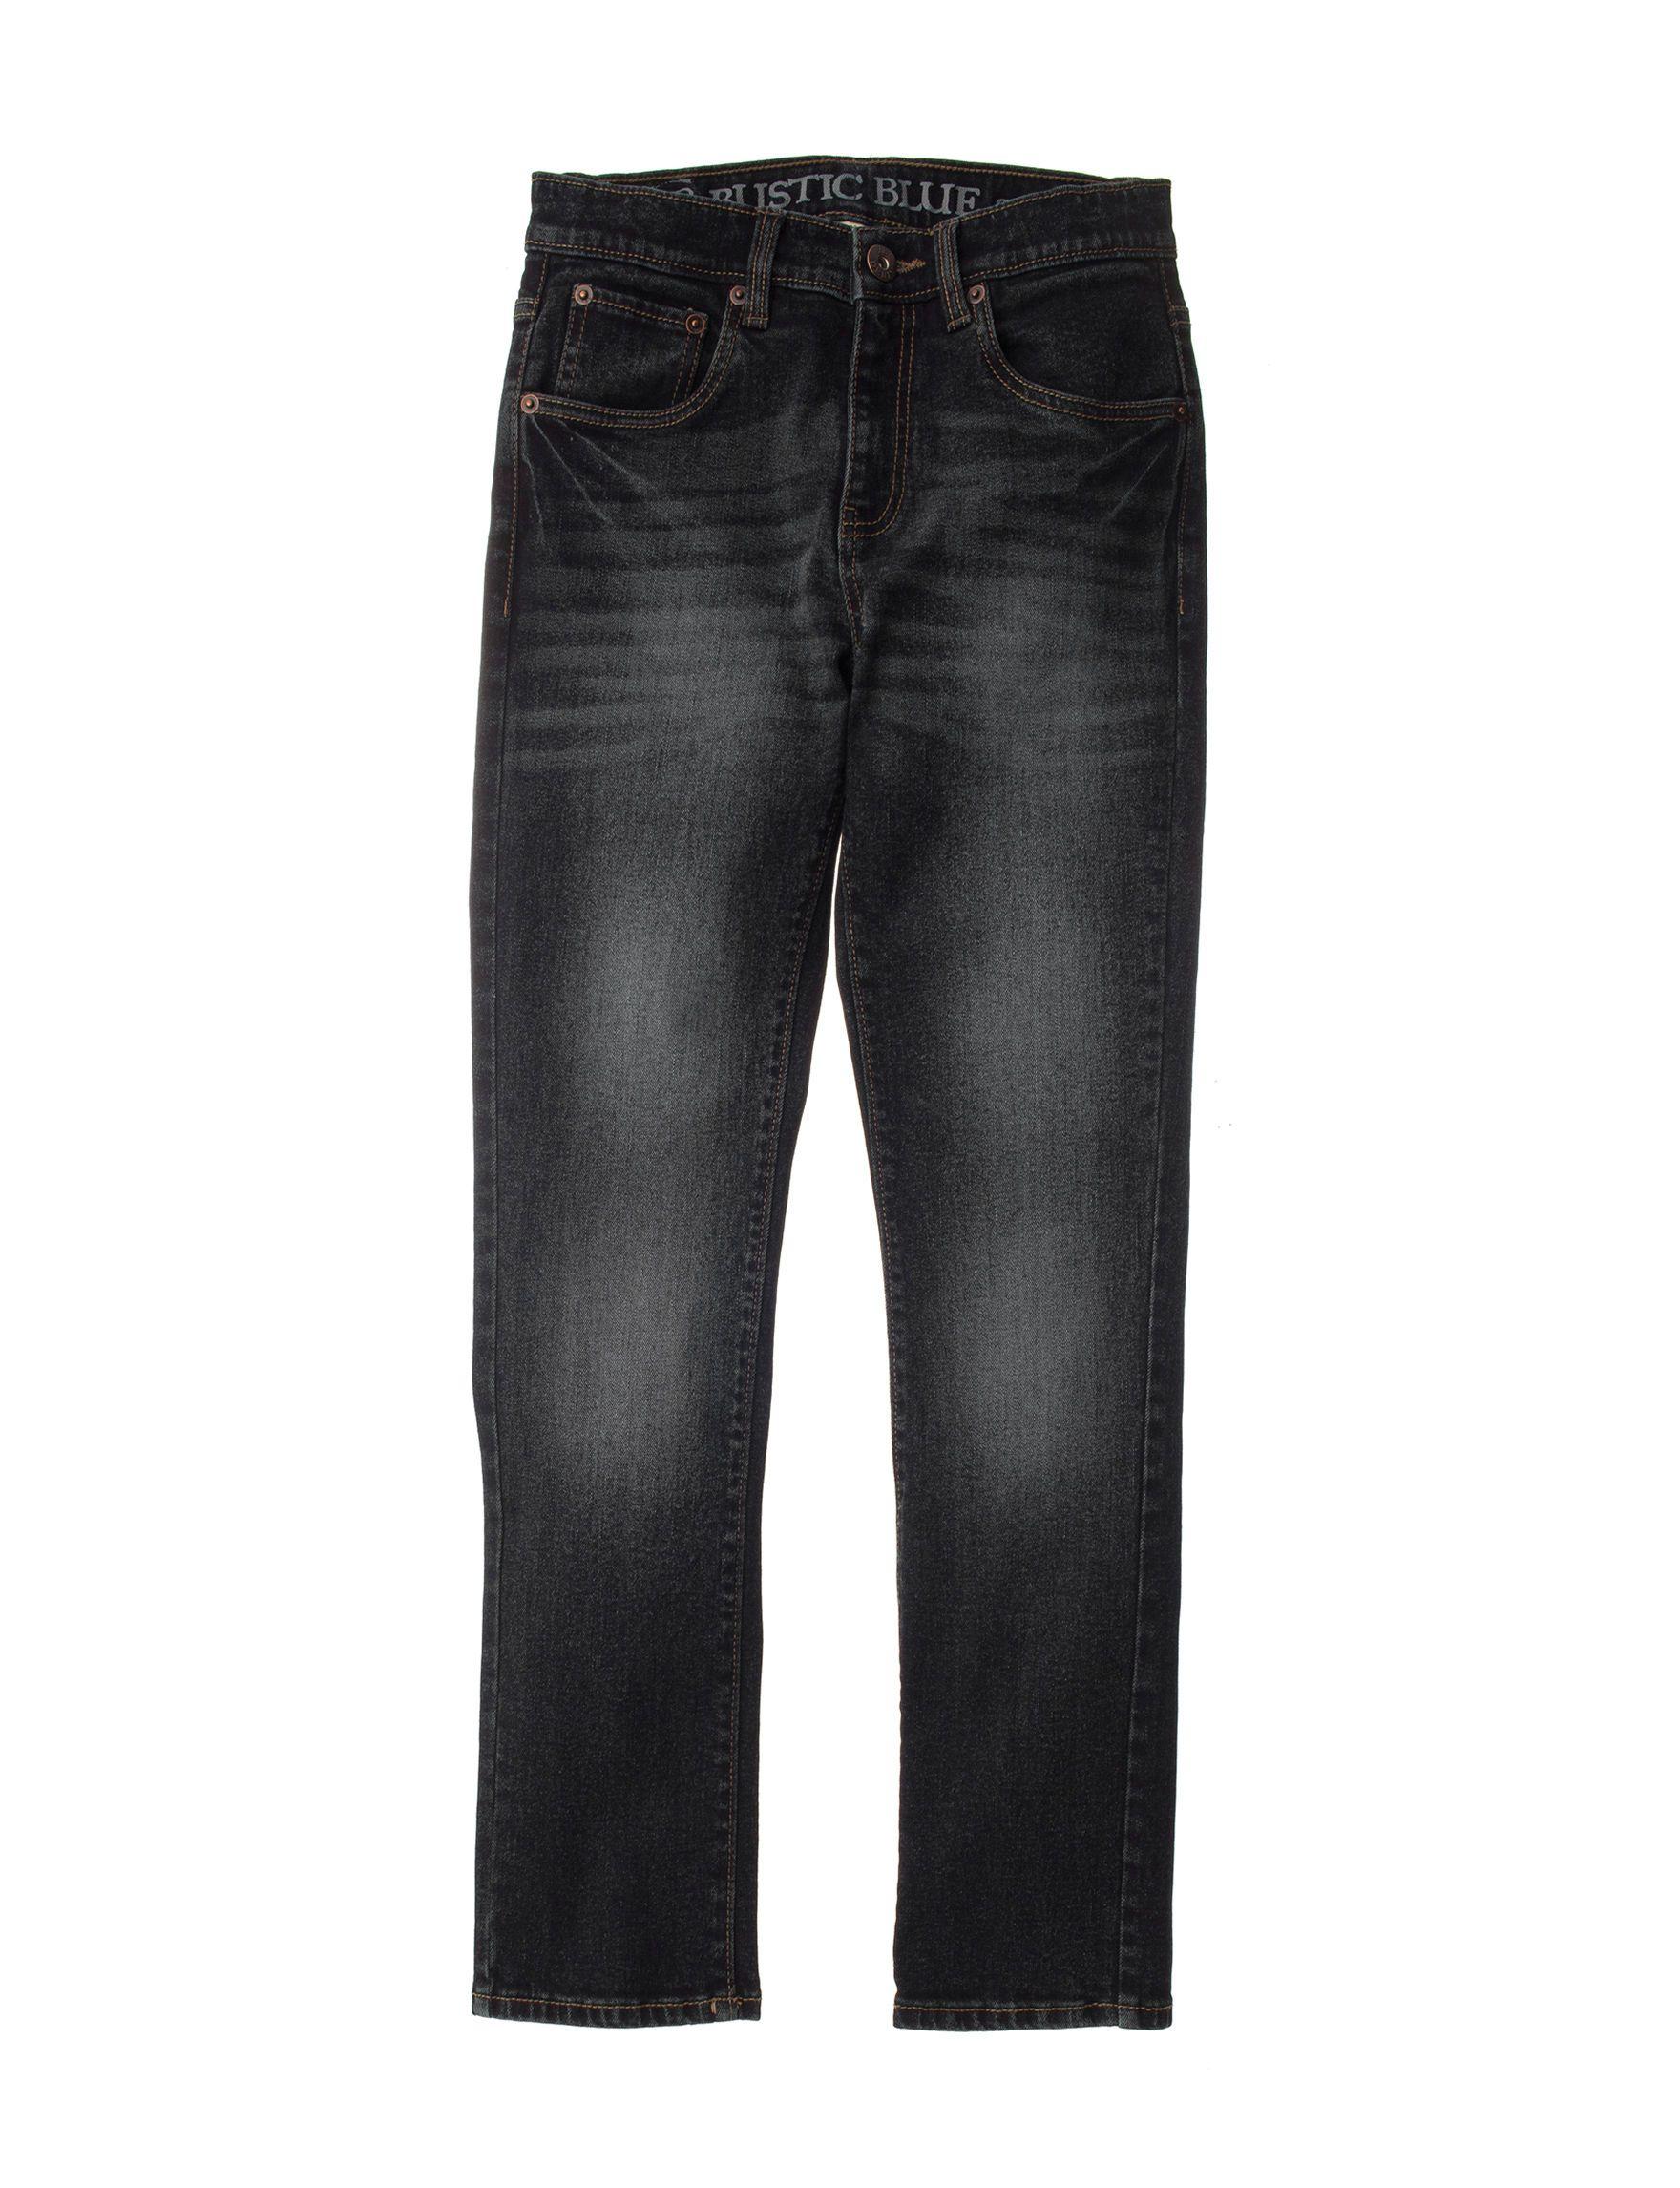 Rustic Blue Slim Stretch Jeans Boys 8 20 Boys Jeans Stretch Jeans Boys